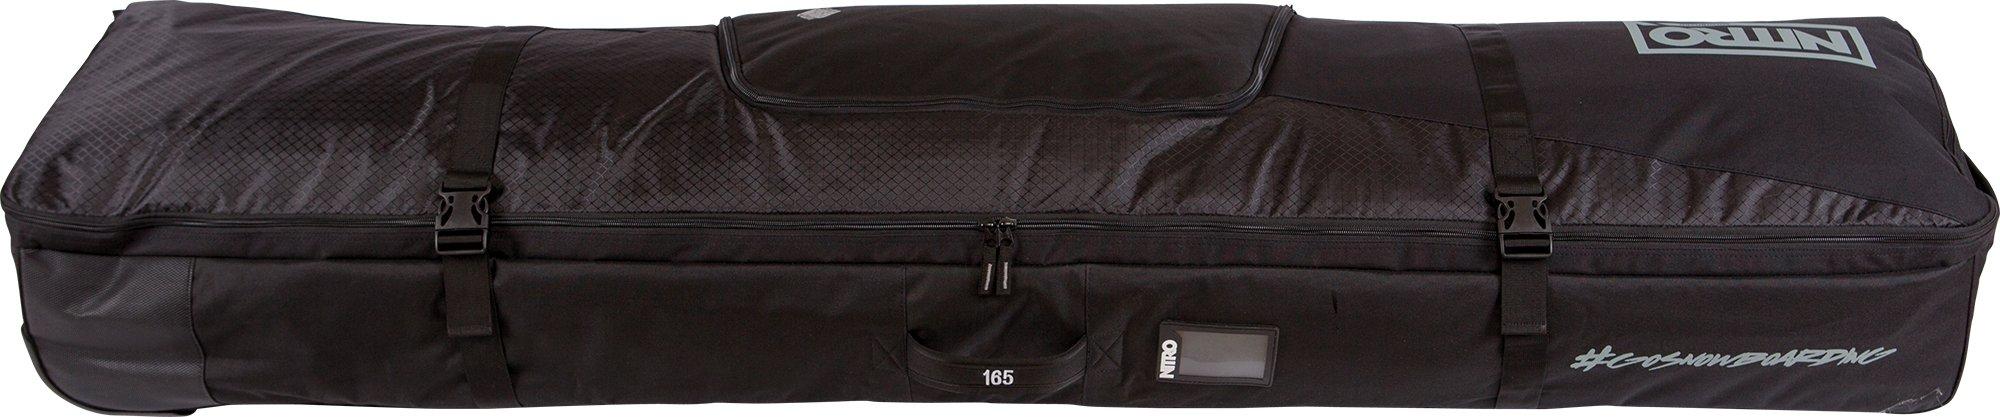 Nitro Tracker Wheelie Snowboard Bag 165cm (black)